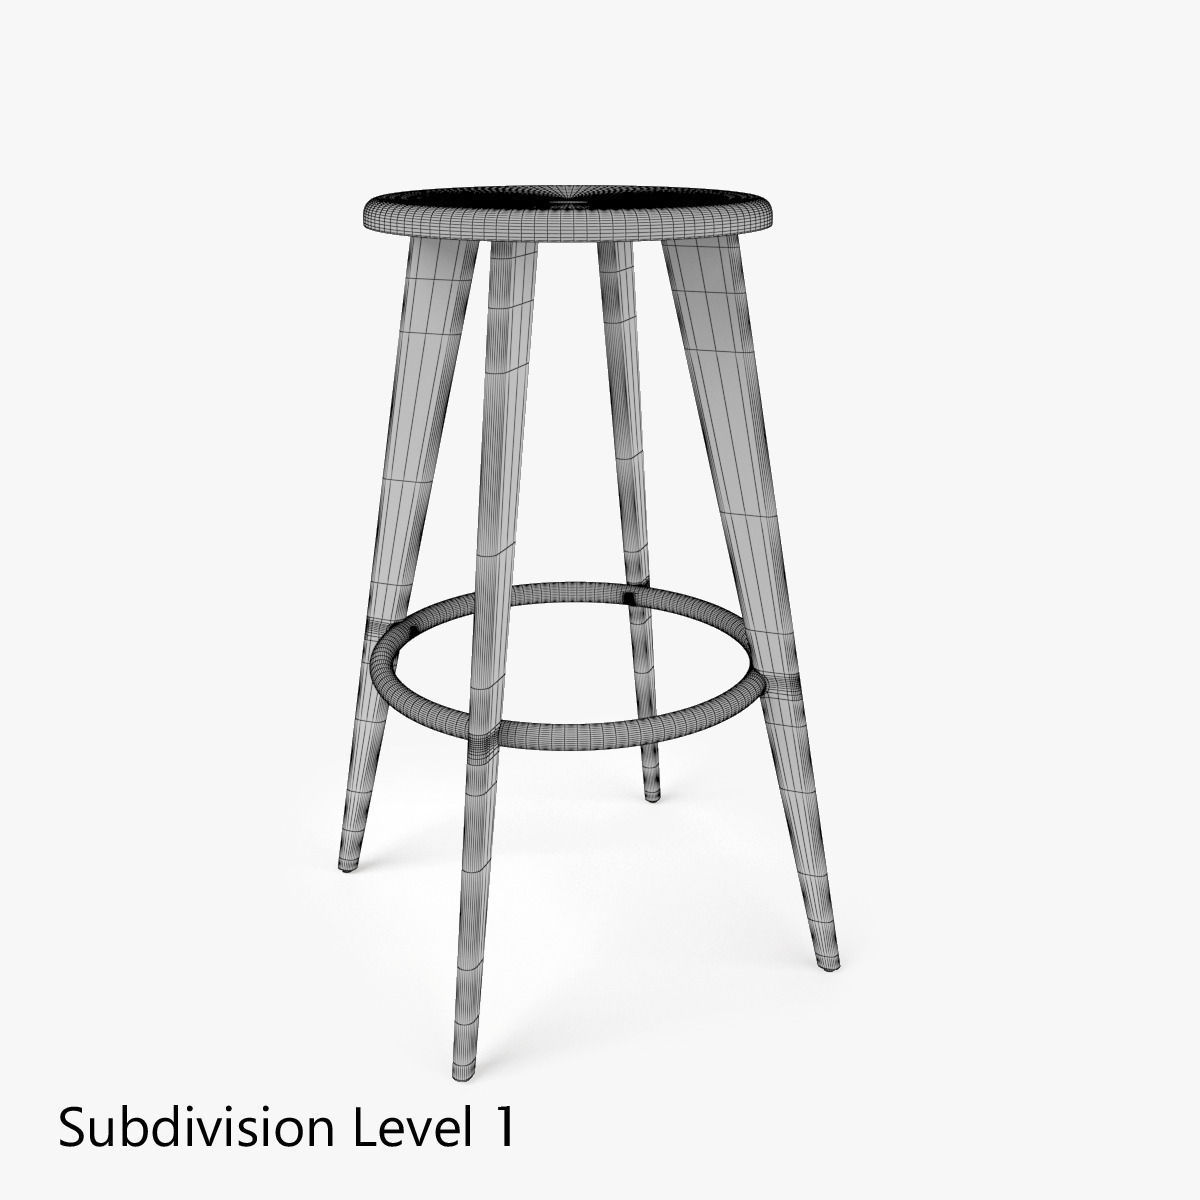 vitra tabouret haut bar stool 3d model max obj fbx mtl. Black Bedroom Furniture Sets. Home Design Ideas